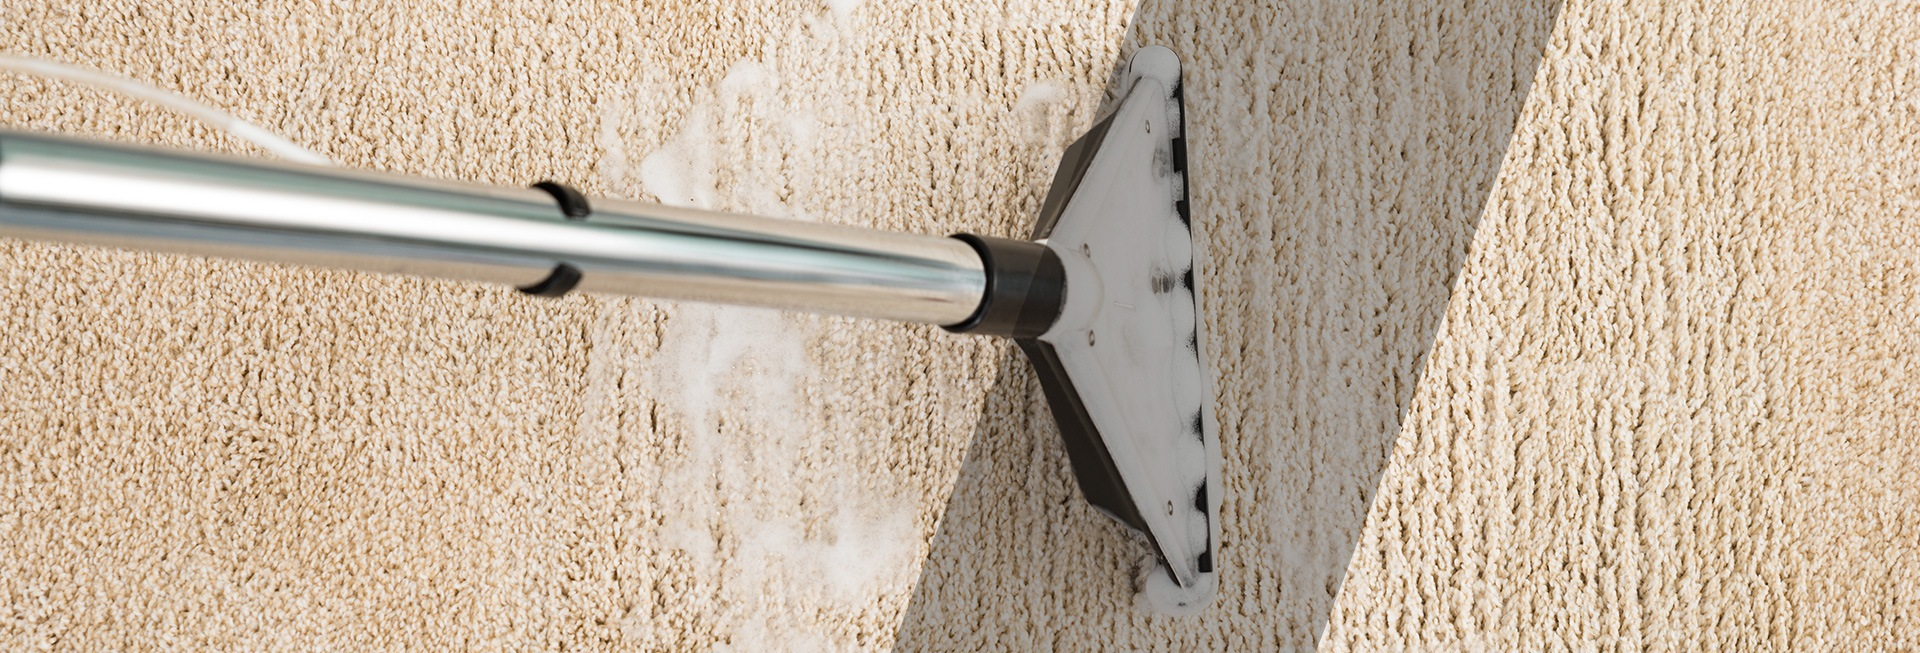 Carpet Cleaning Service Slide